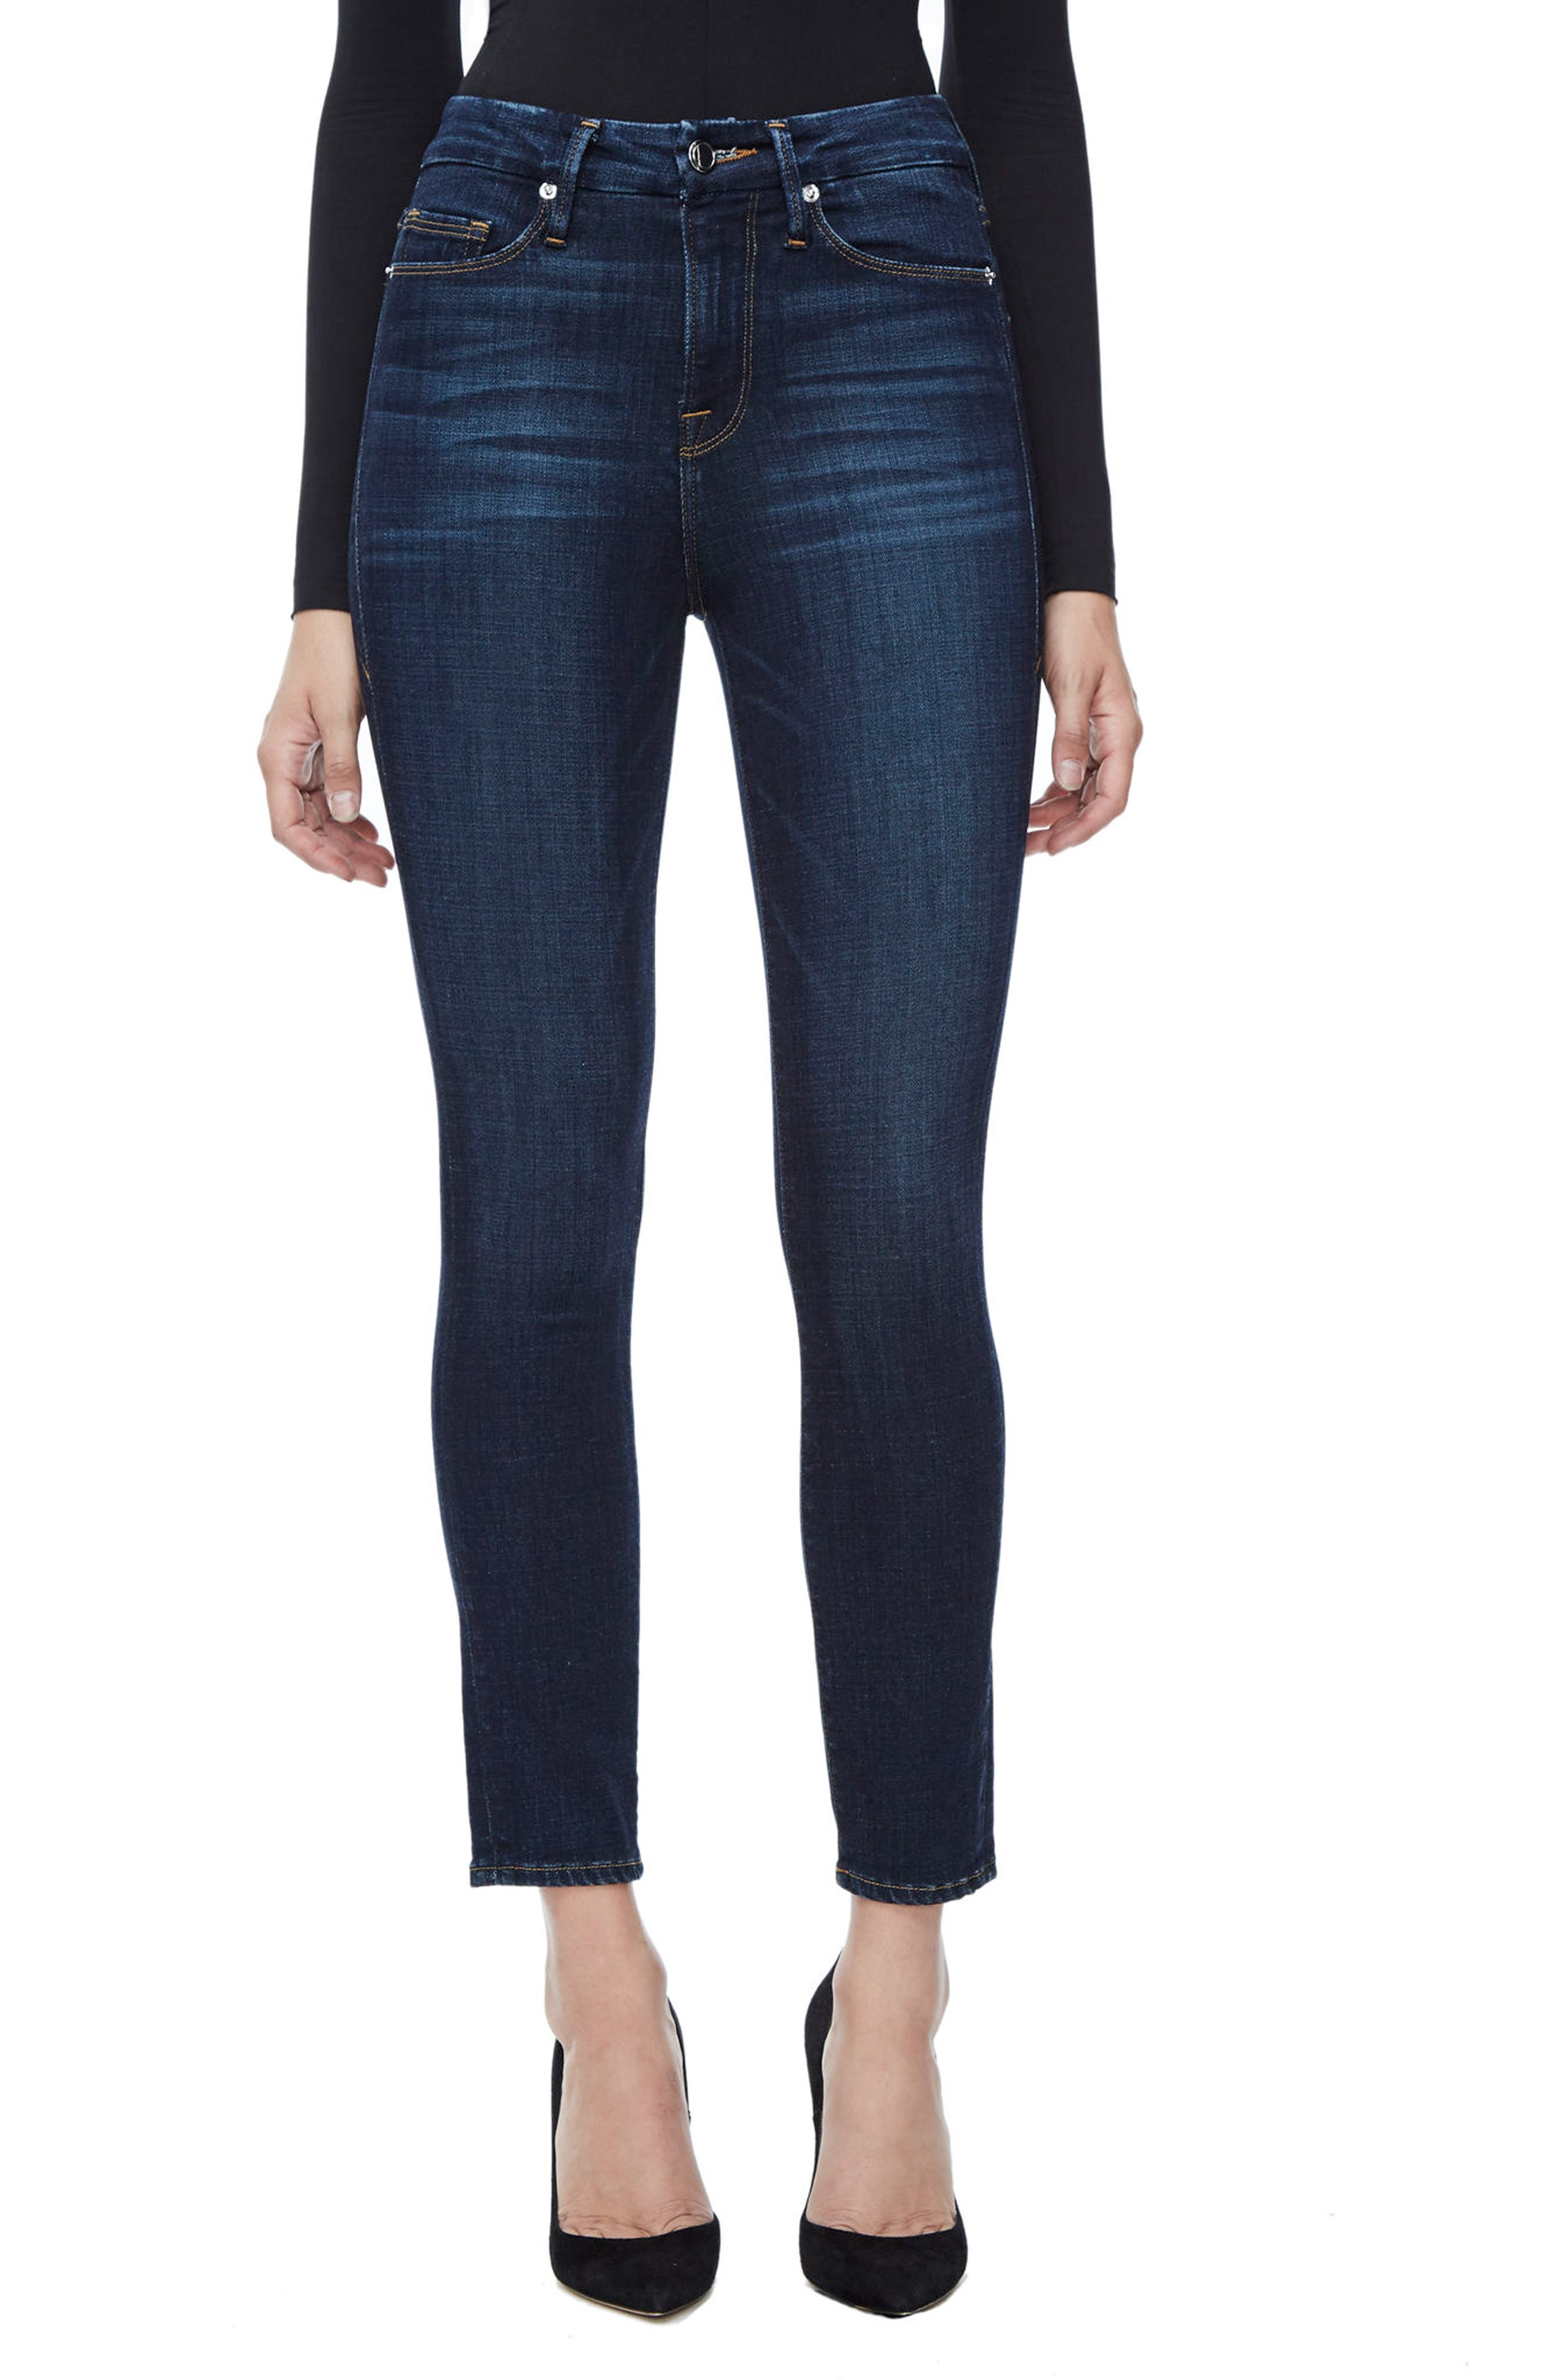 Main Image - Good American Good Legs High Waist Ankle Skinny Jeans (Blue 089) (Regular & Plus Size)